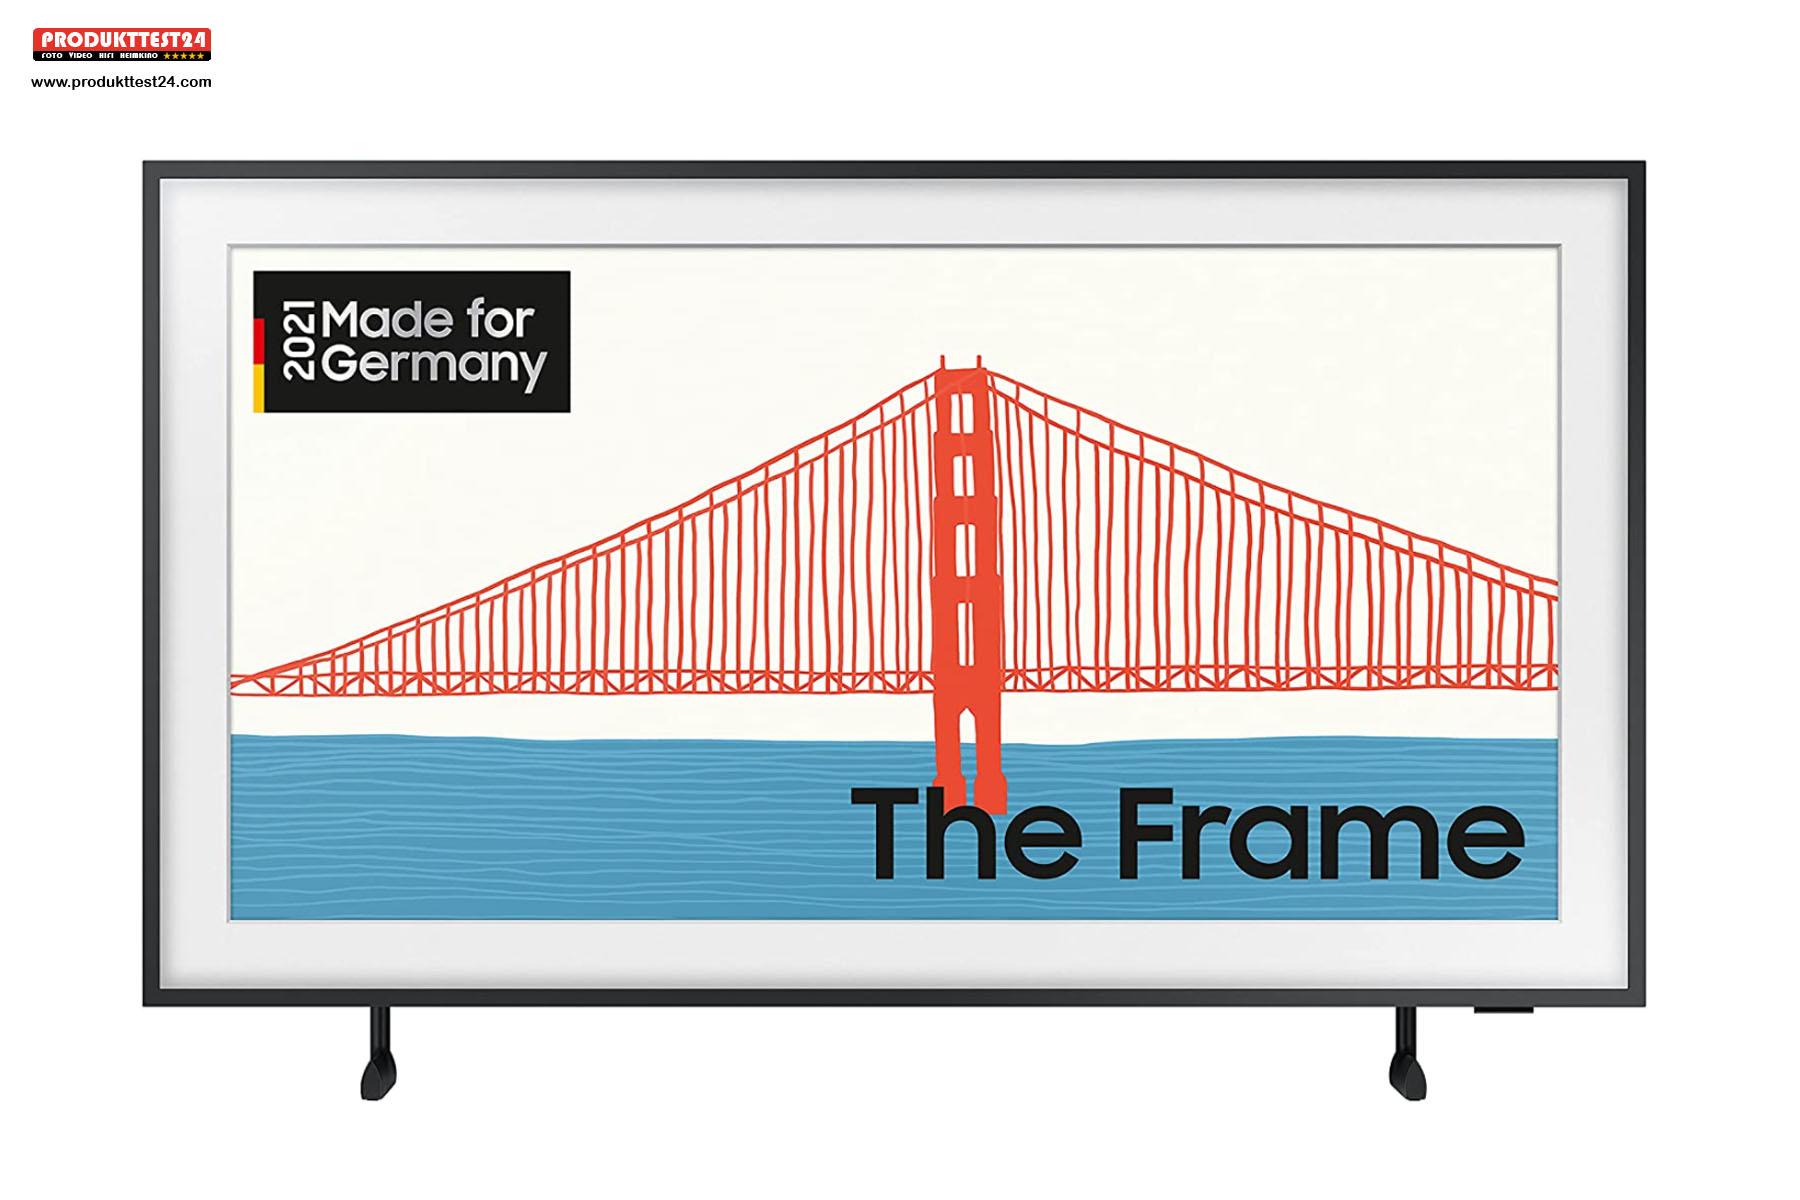 Der Samsung The Frame GQ43LS03A QLED 4K-Fernseher